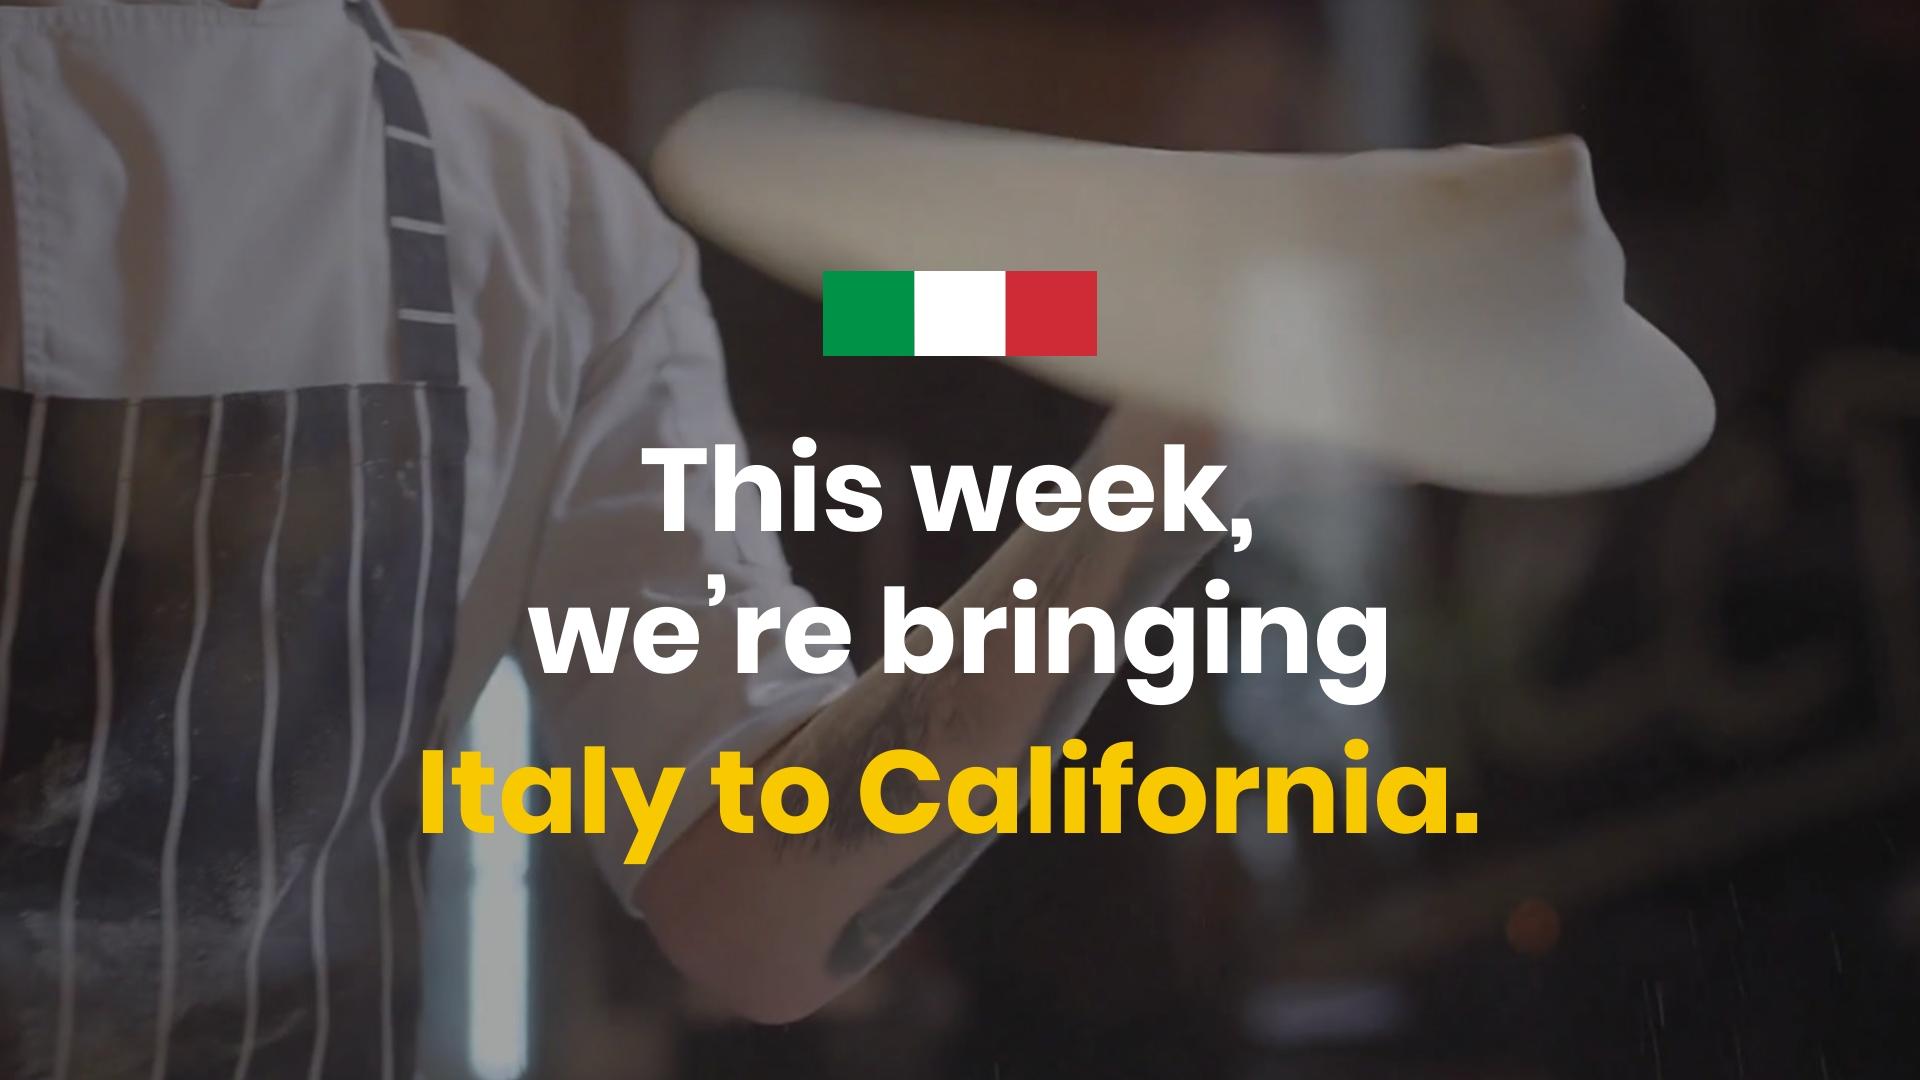 Restaurant Twitter Video Ad Template